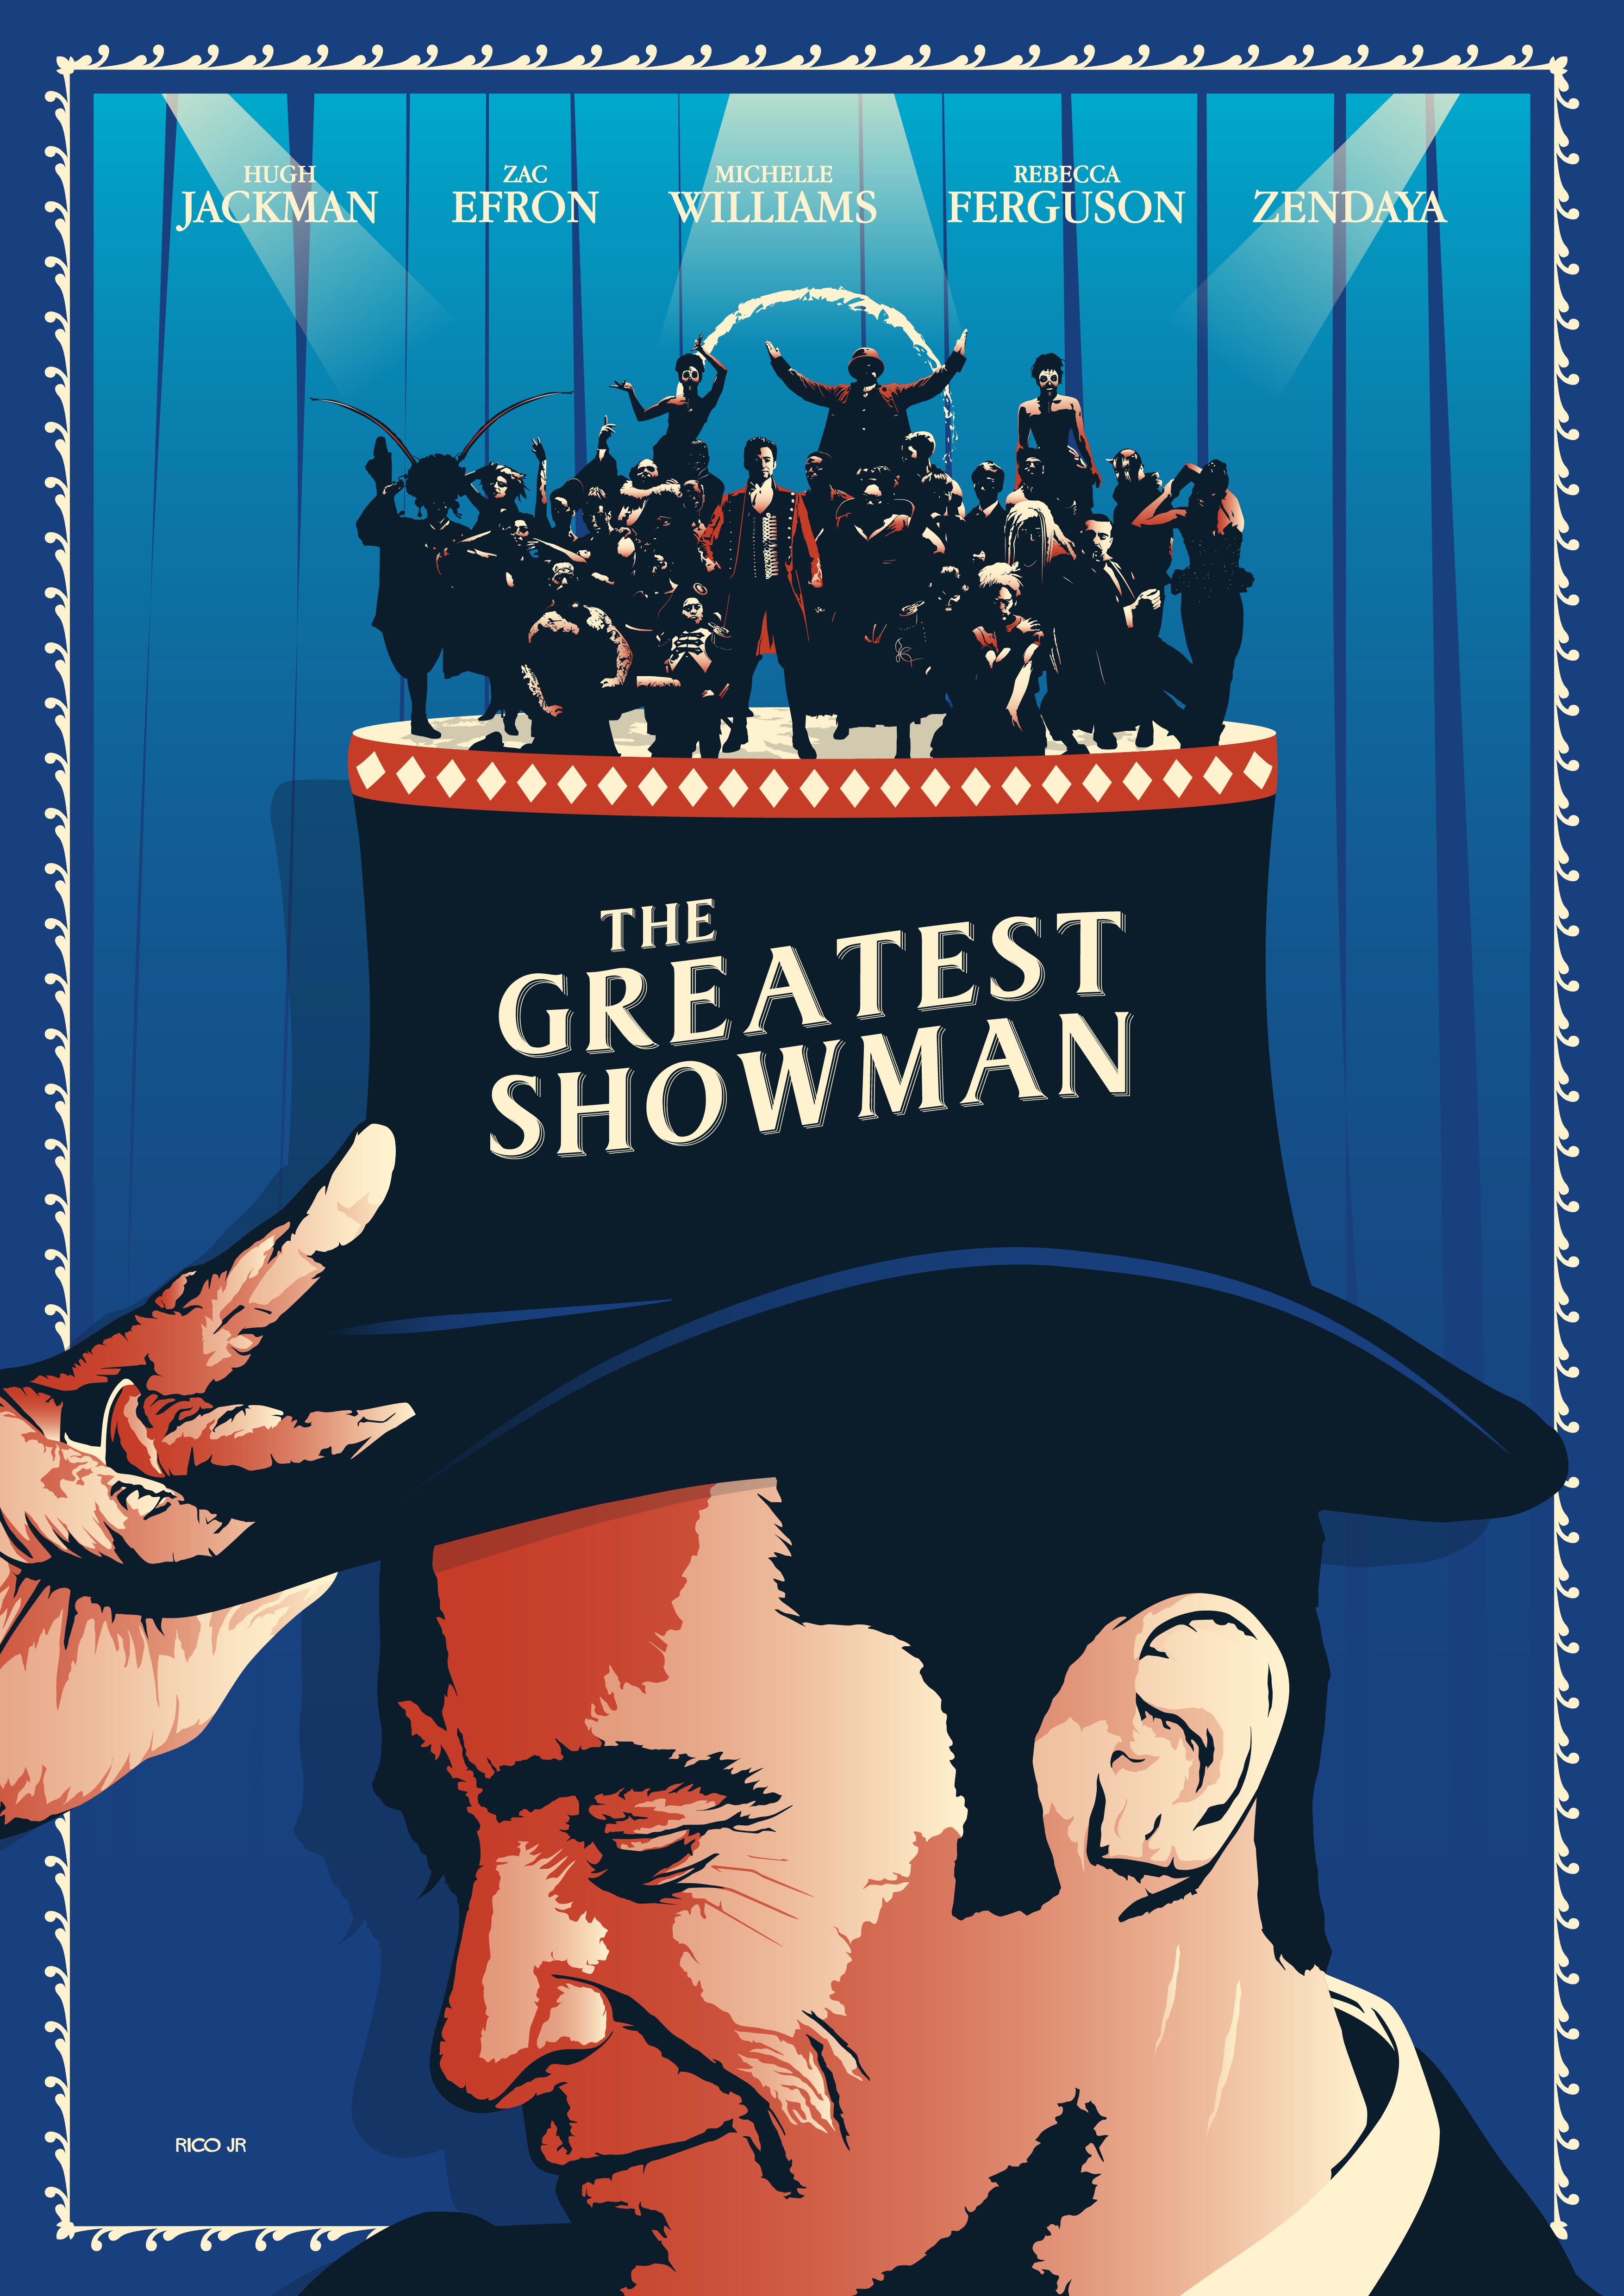 Decouvrez Ce Projet Behance The Greatest Showman Poster Art Https Www Behance Net Gallery 63771665 Showman Movie The Greatest Showman Broadway Posters